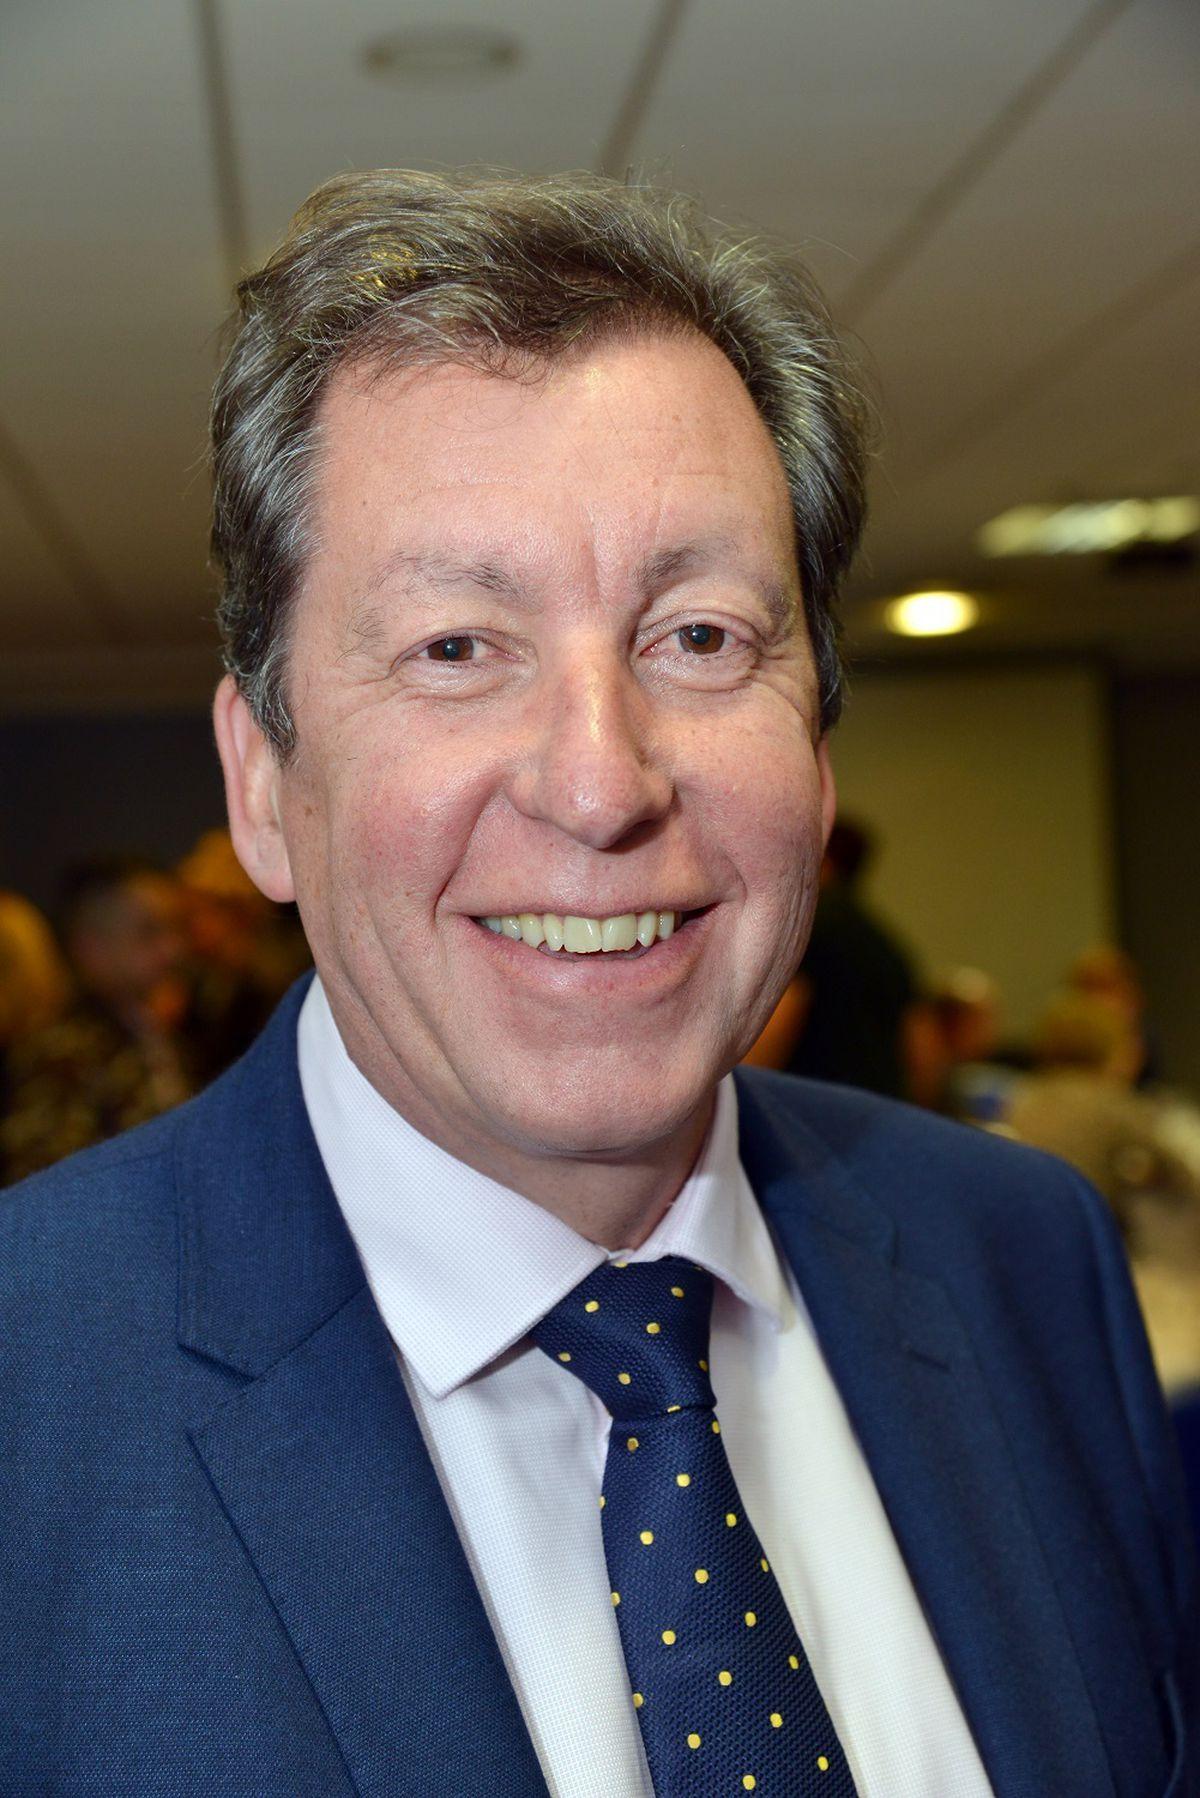 Telford College Principal Graham Guest